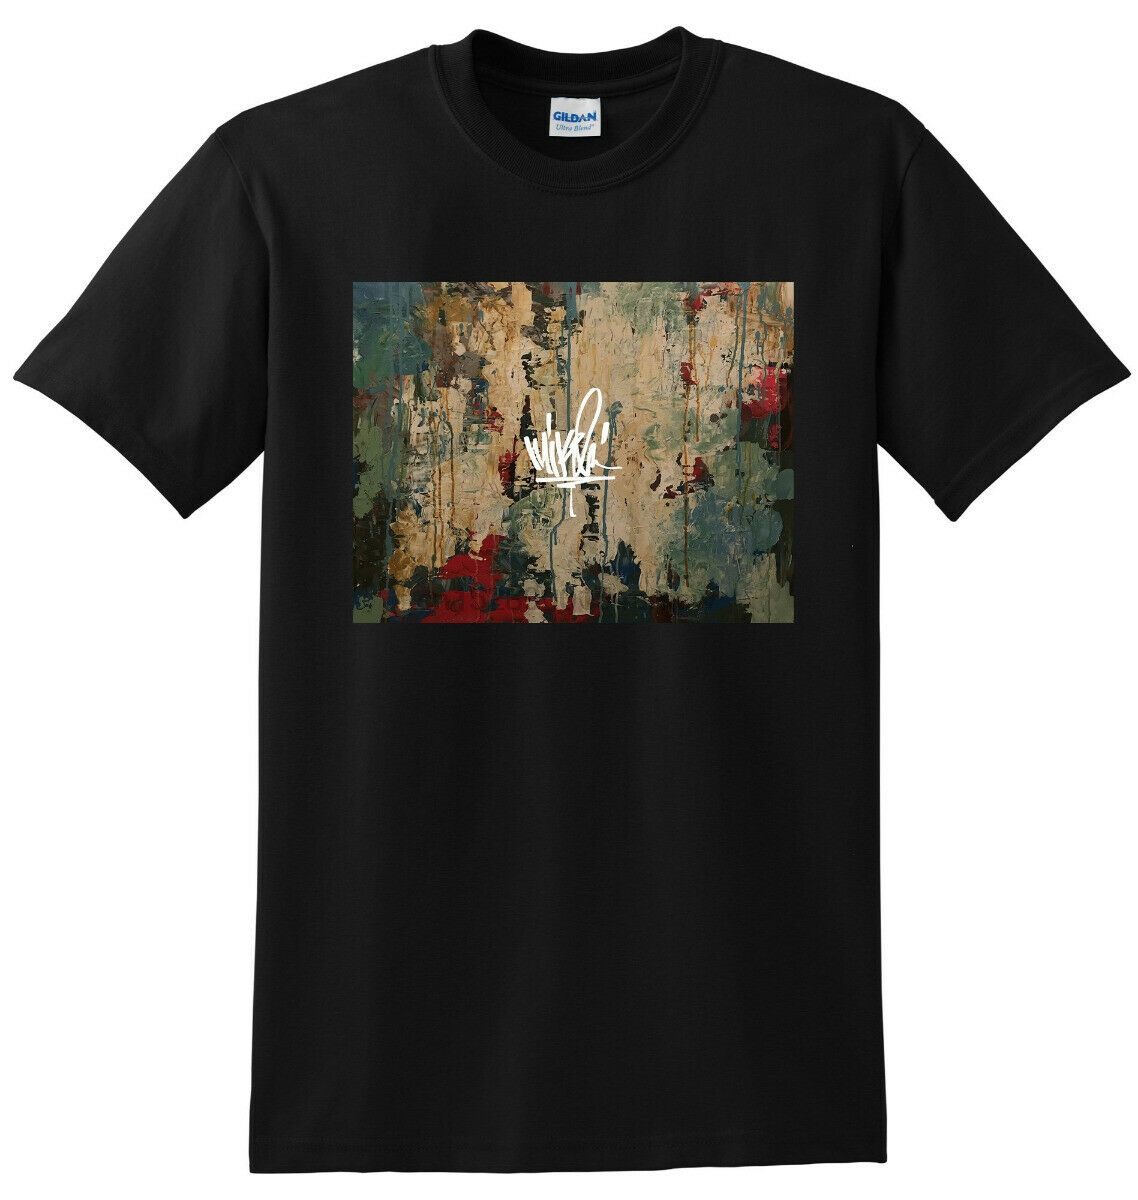 Neu Mike Shinoda Post Traumatic Tour 2019 T Shirt S-5XL Limited !!